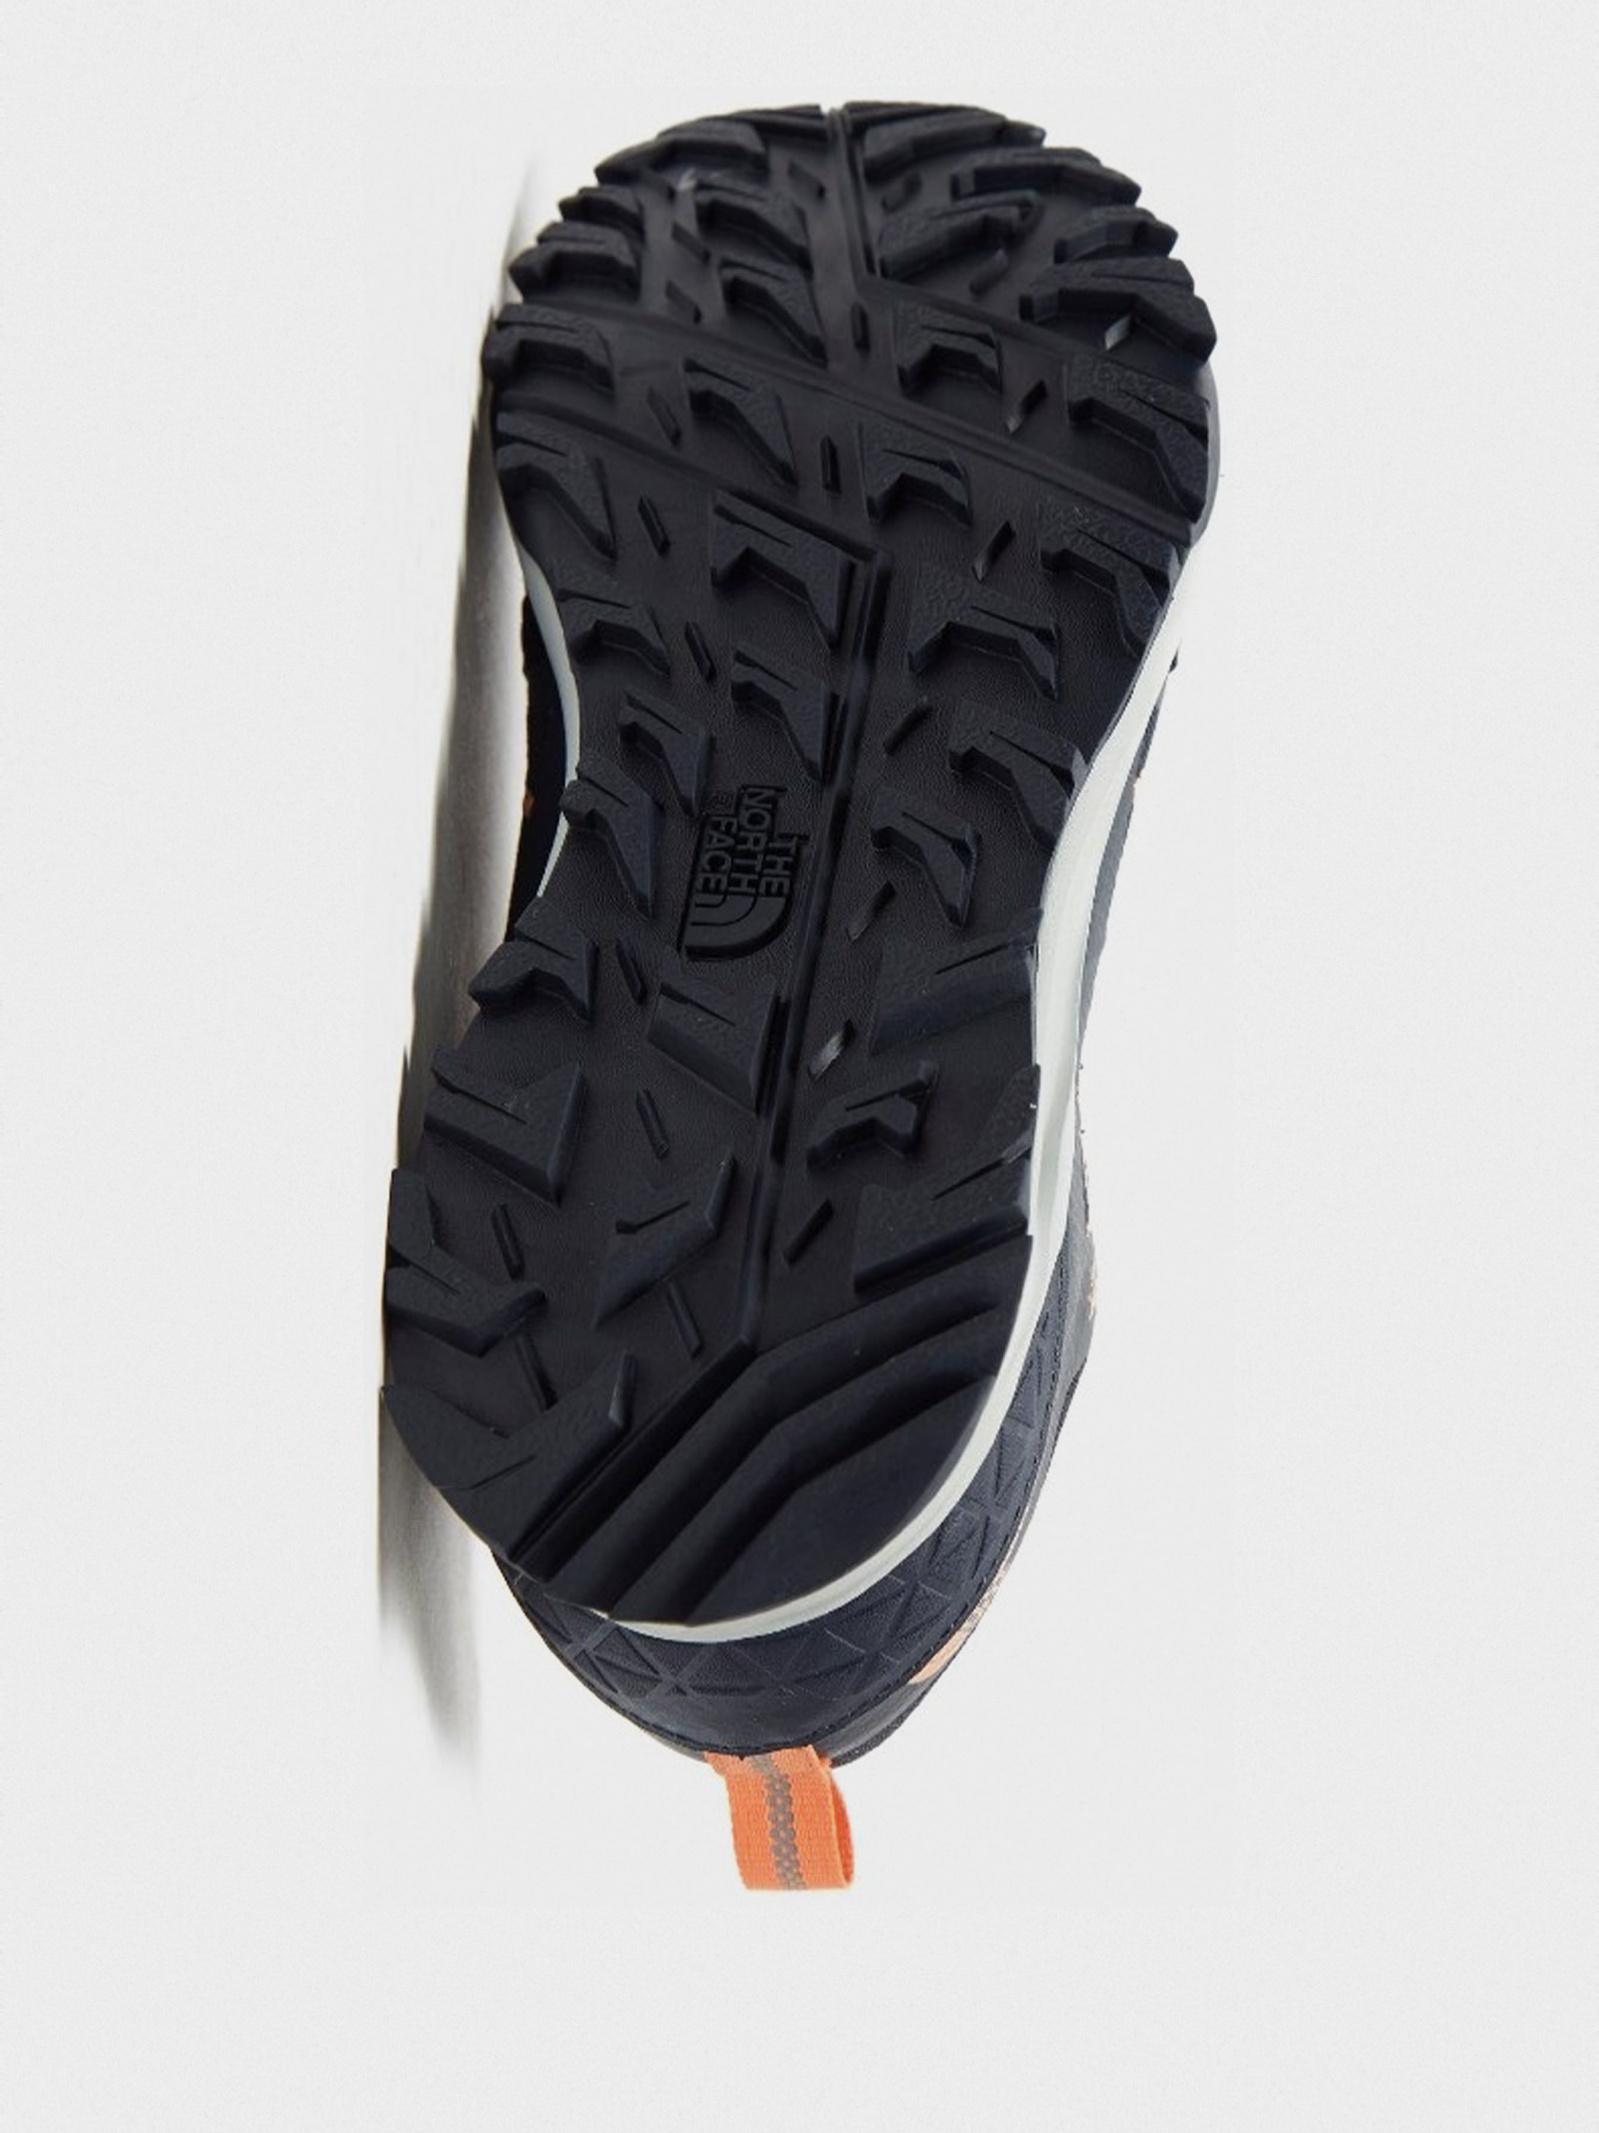 Кроссовки для женщин The North Face Women's Litewave Fastpack II W NF0A4PF4MZ61 цена, 2017